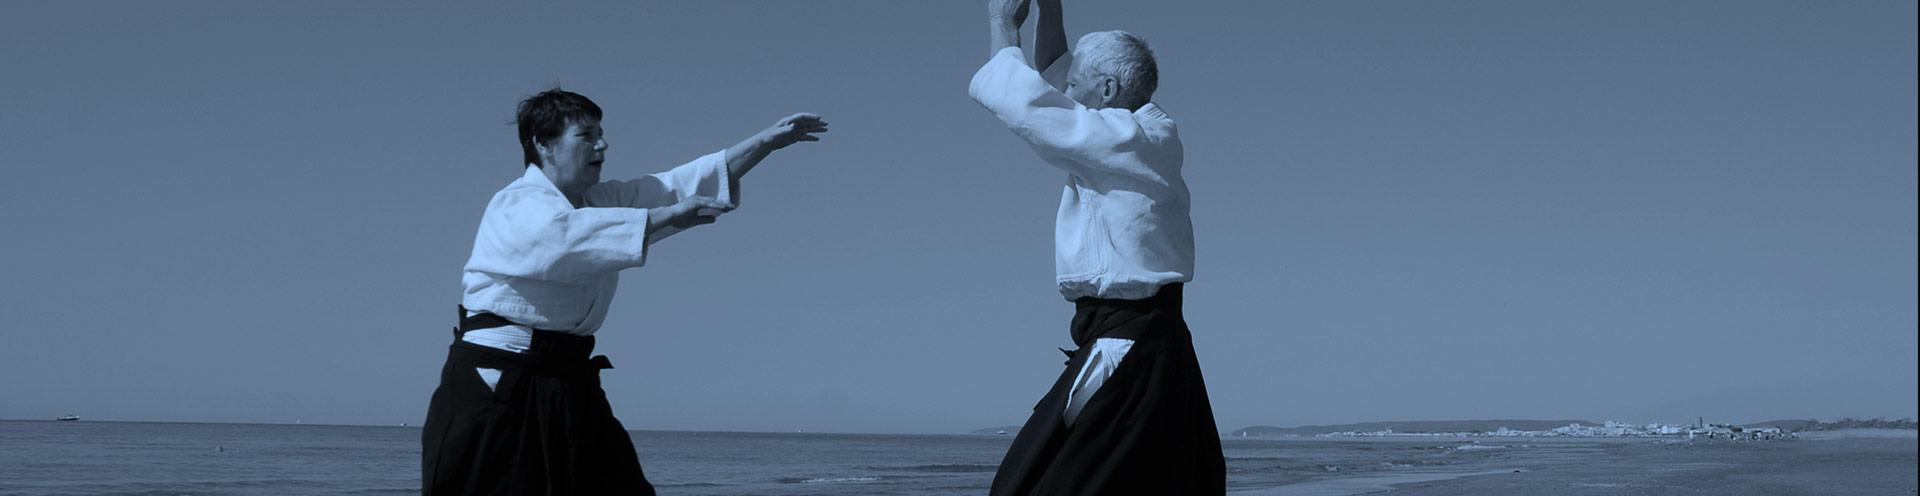 Aïkido Haut-Rhin - La pratique de l'Aïkido